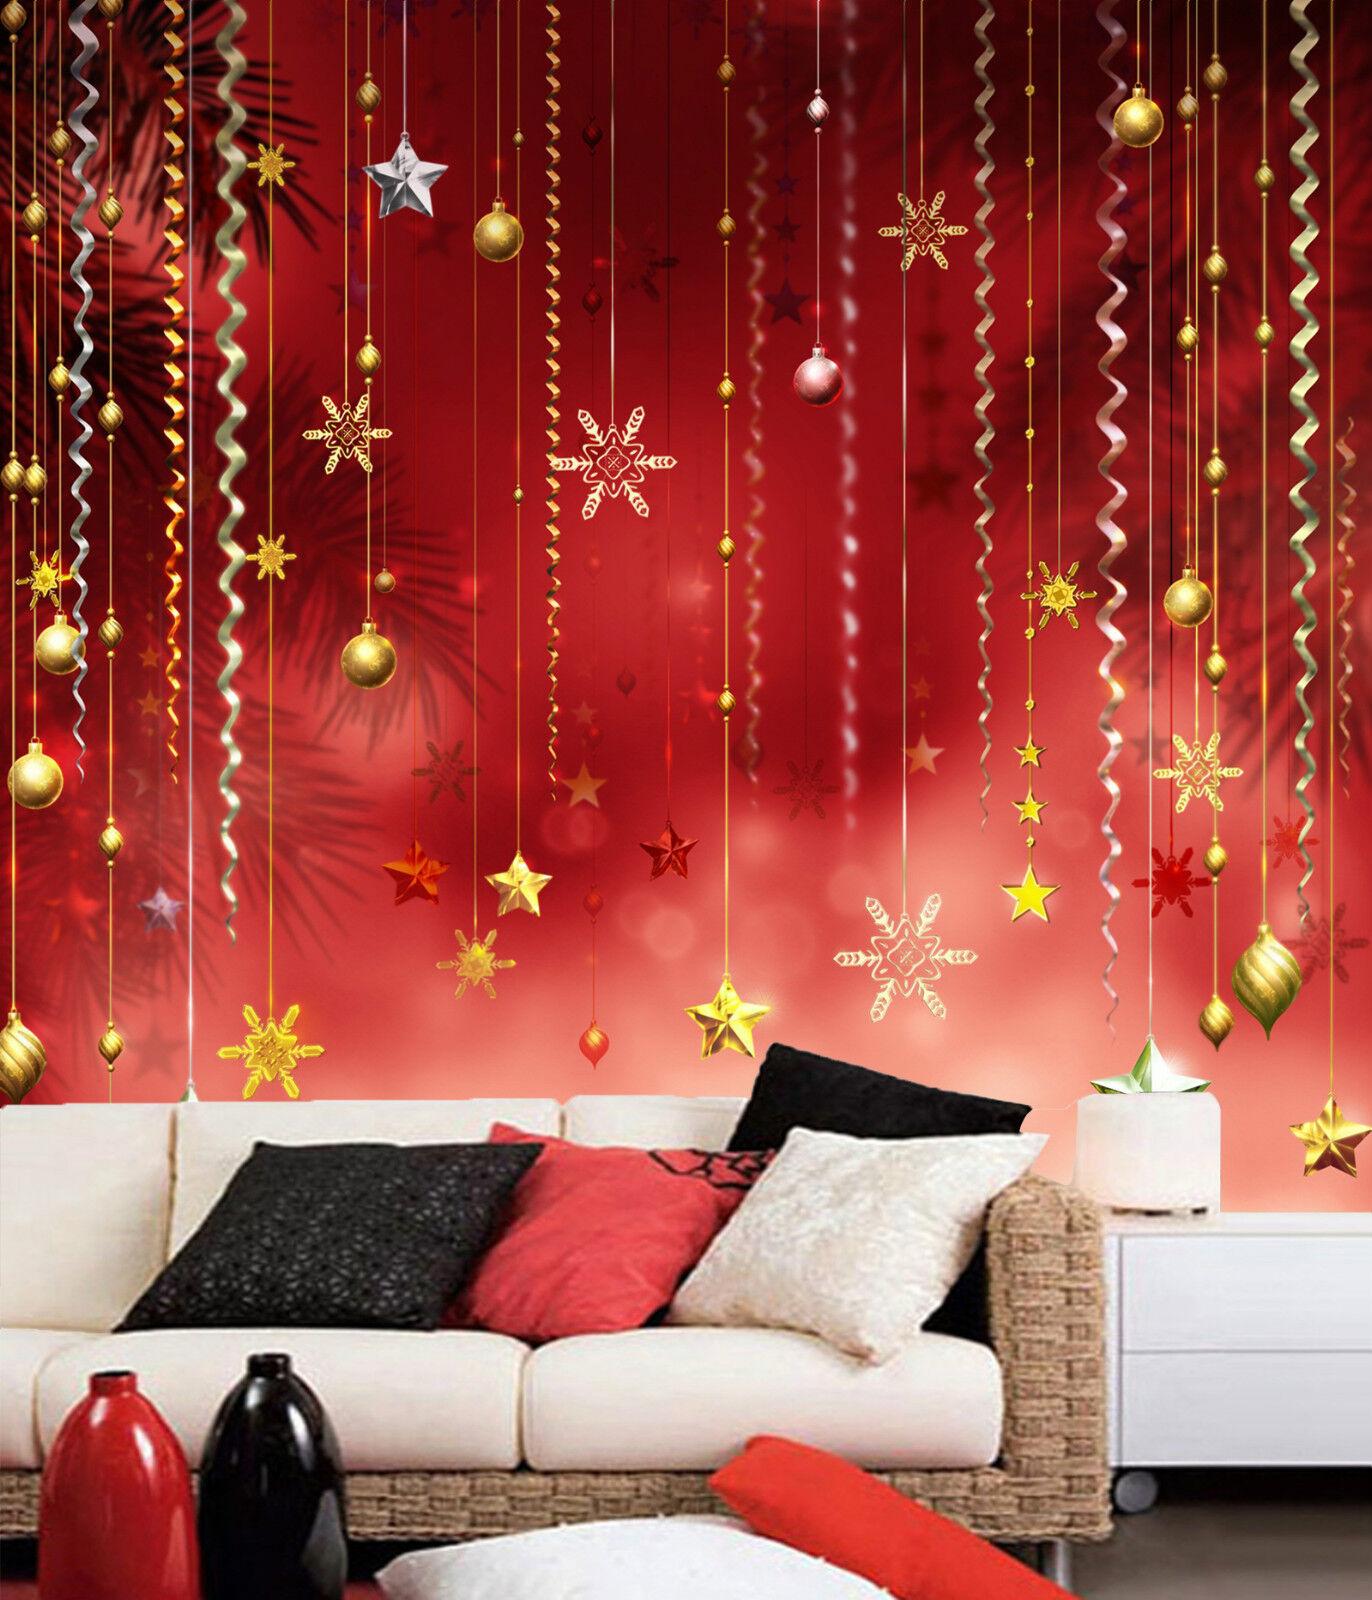 3D Christmas hanging stars WallPaper Murals Wall Print Decal Wall AJ WALLPAPER